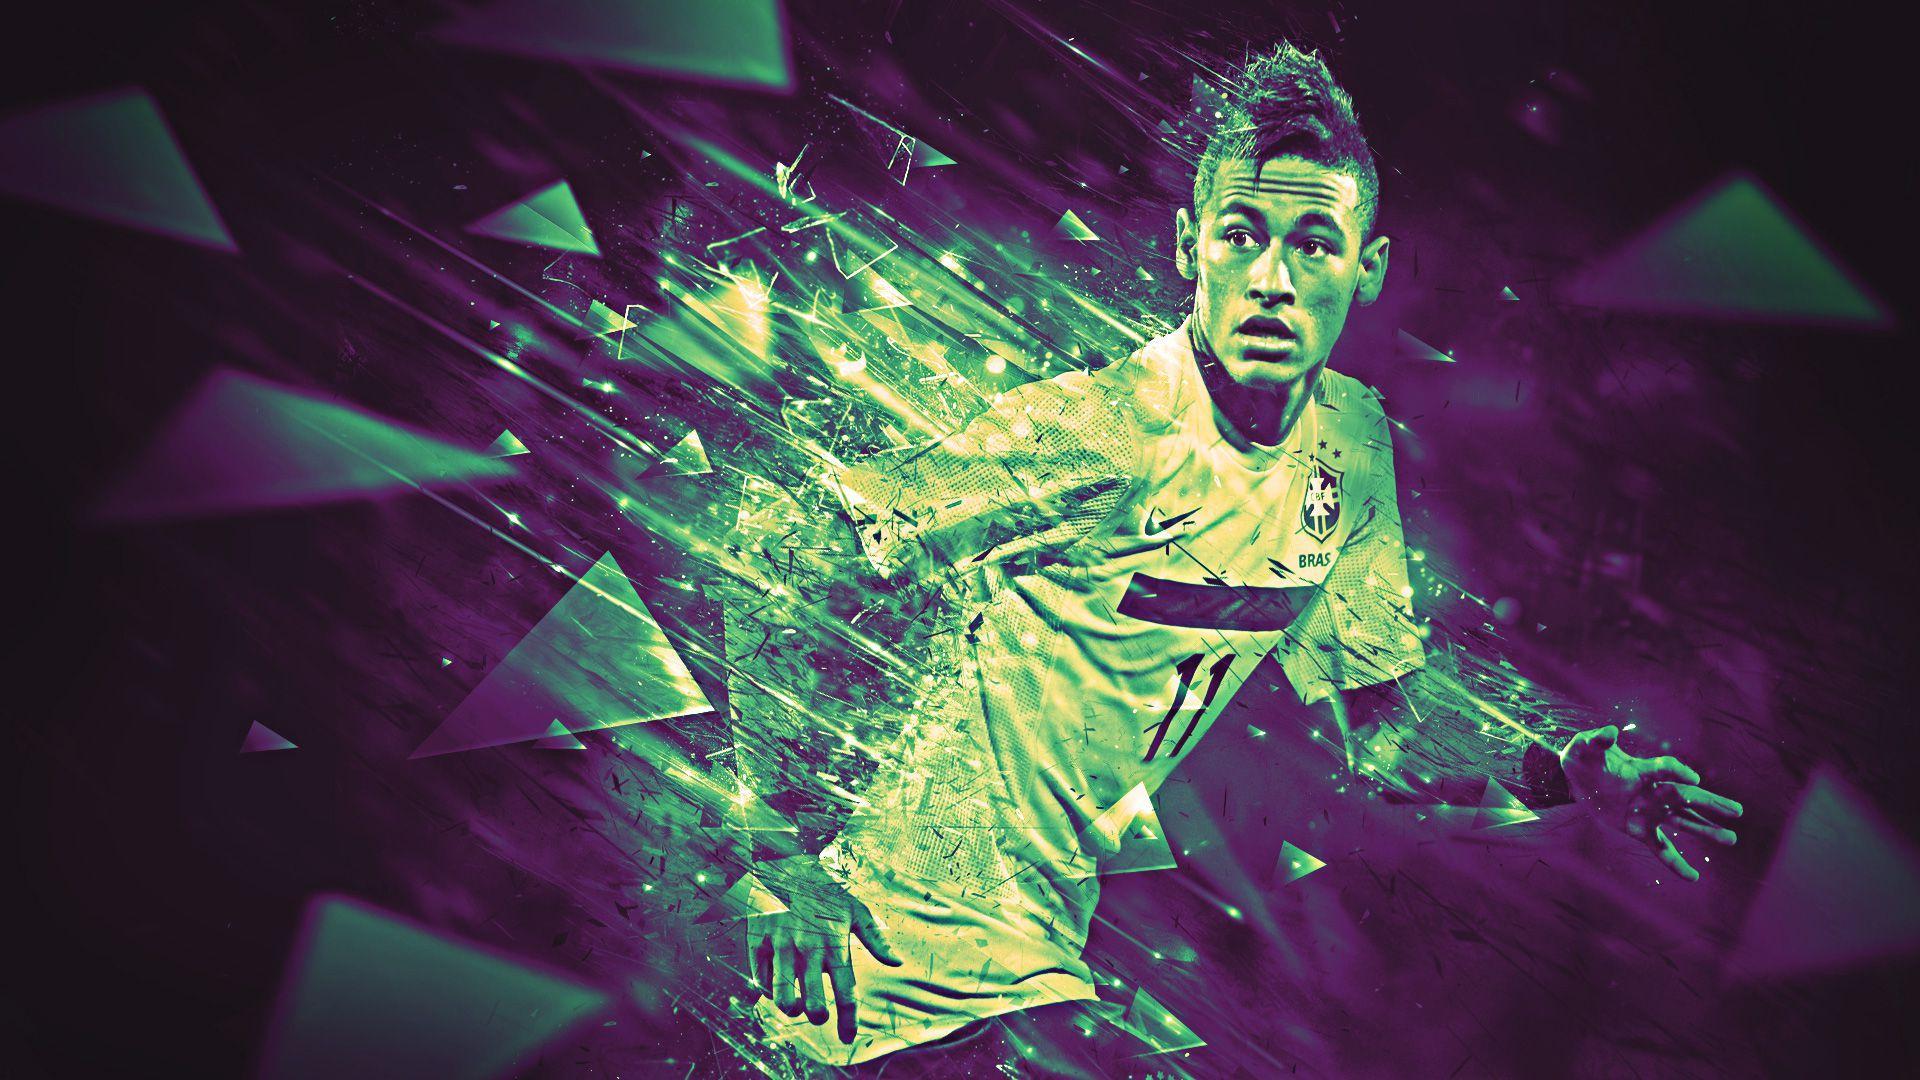 Best HD Neymar Wallpapers 2014   Desktop Wallpapers   Graffies Blog 1920x1080